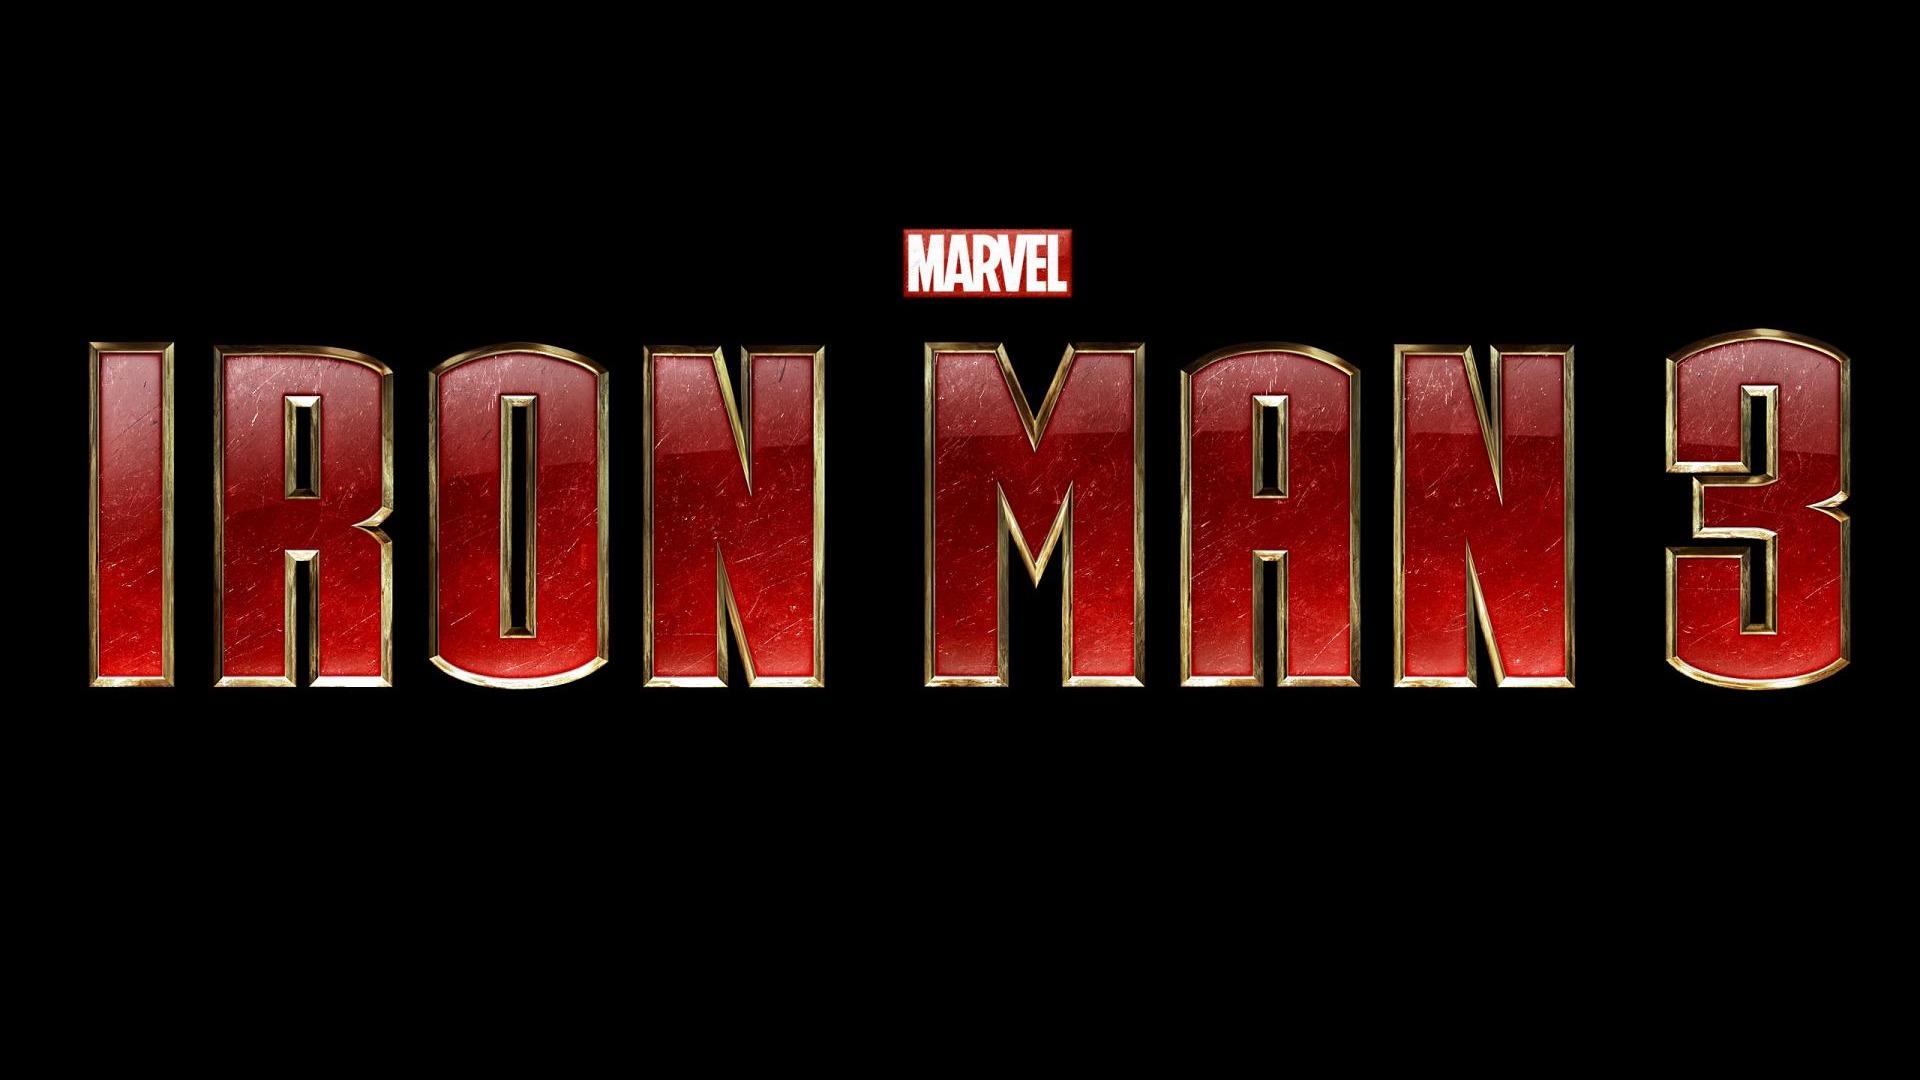 2013 iron man 3 movie hd desktop wallpaper 07 1920x1080